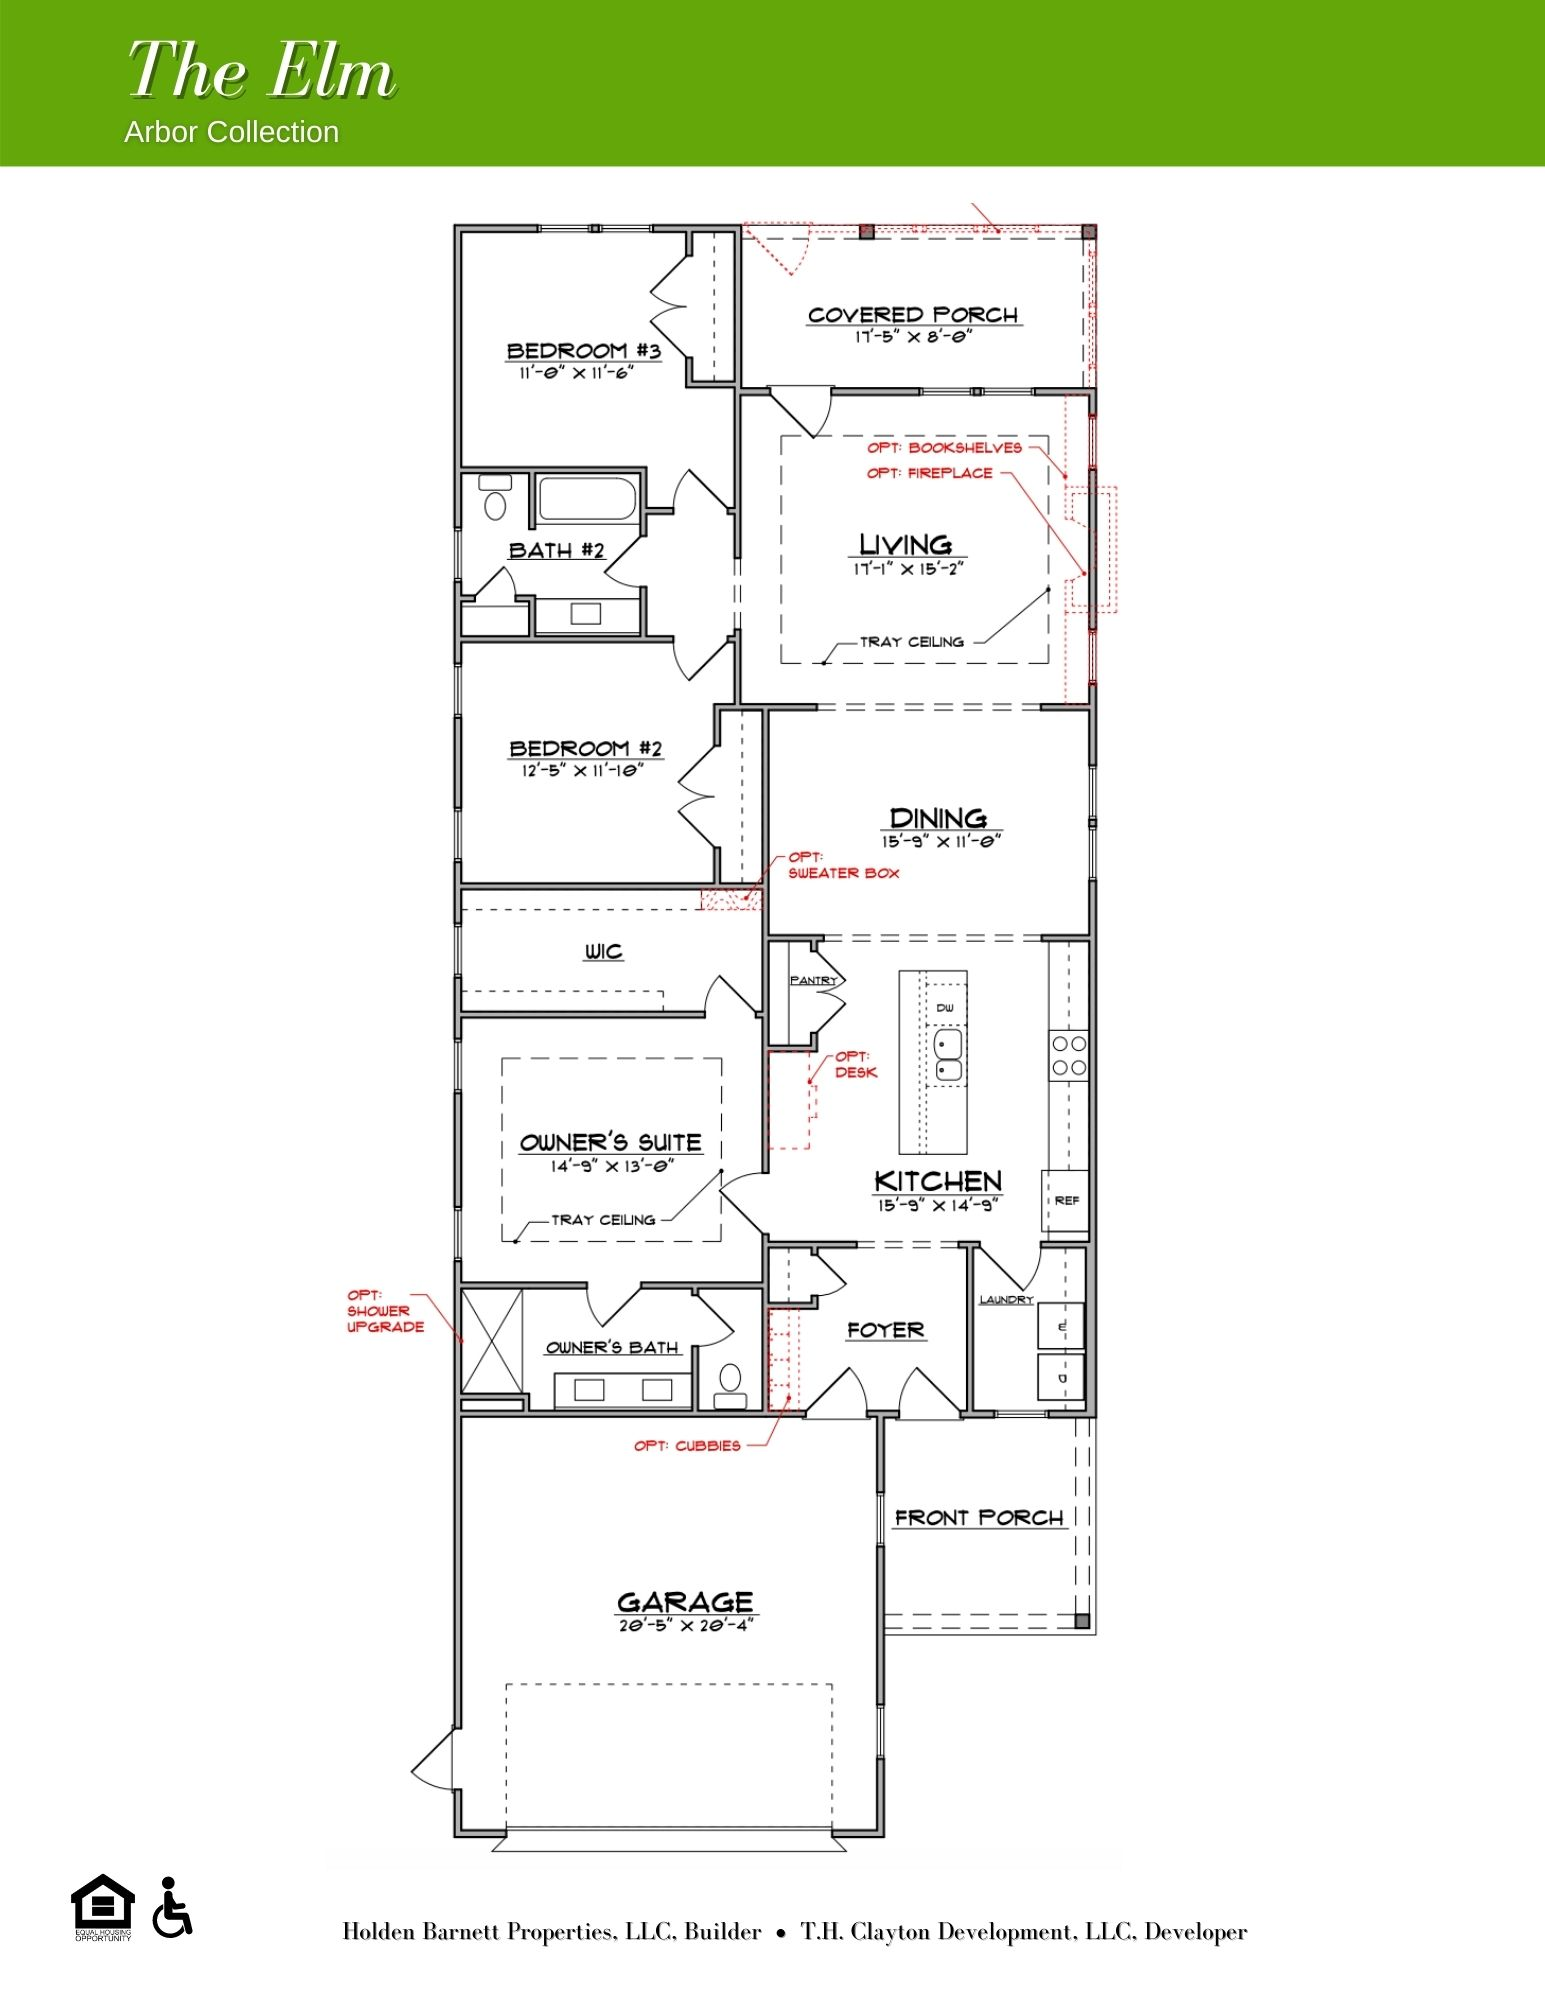 The Elm First Floor Floorplan